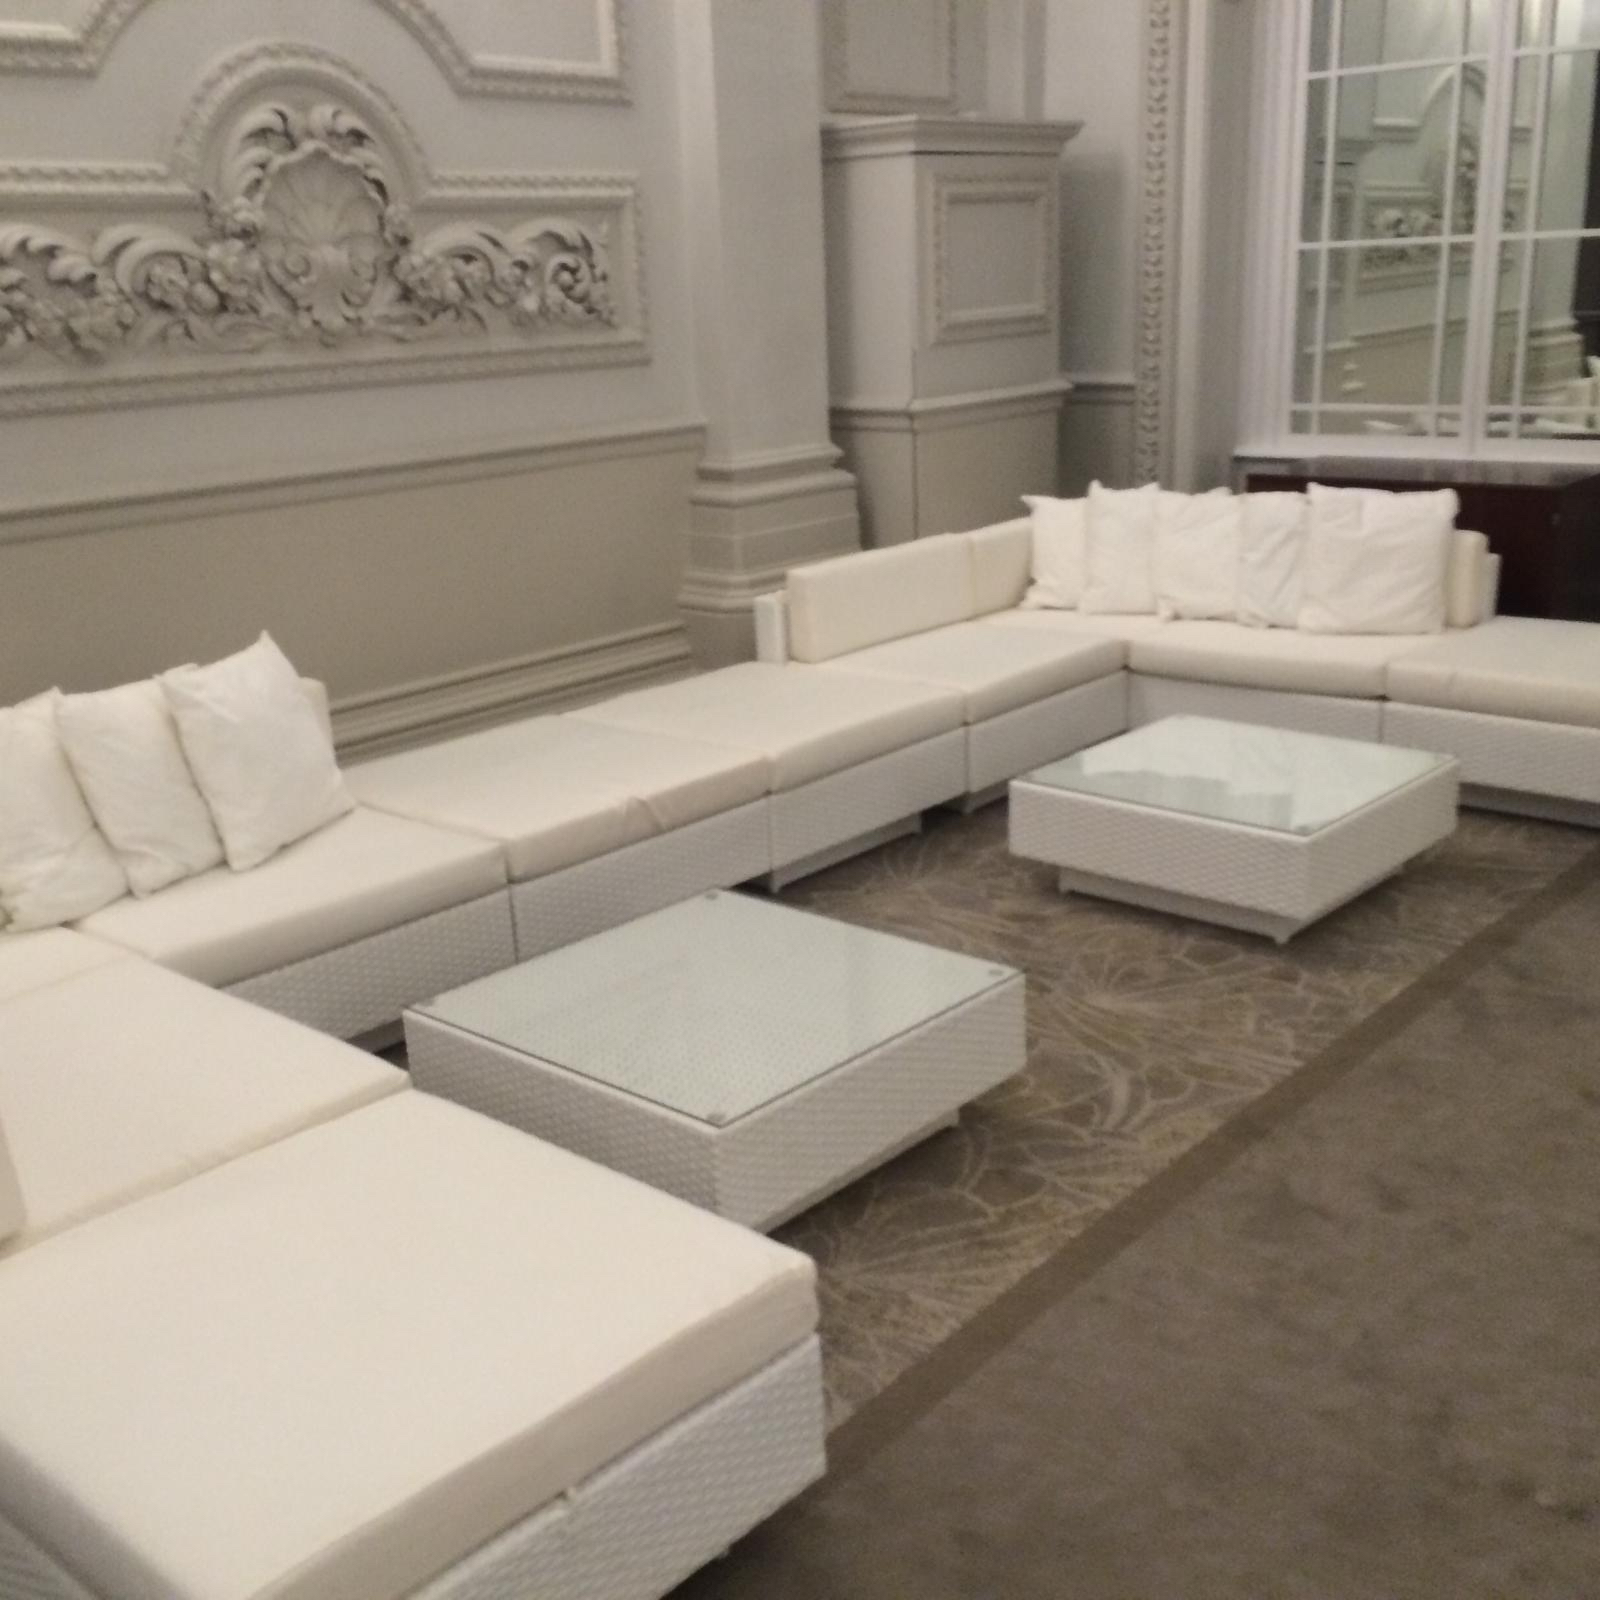 rattan furniture hire: white rattan sofas at Langham hotel